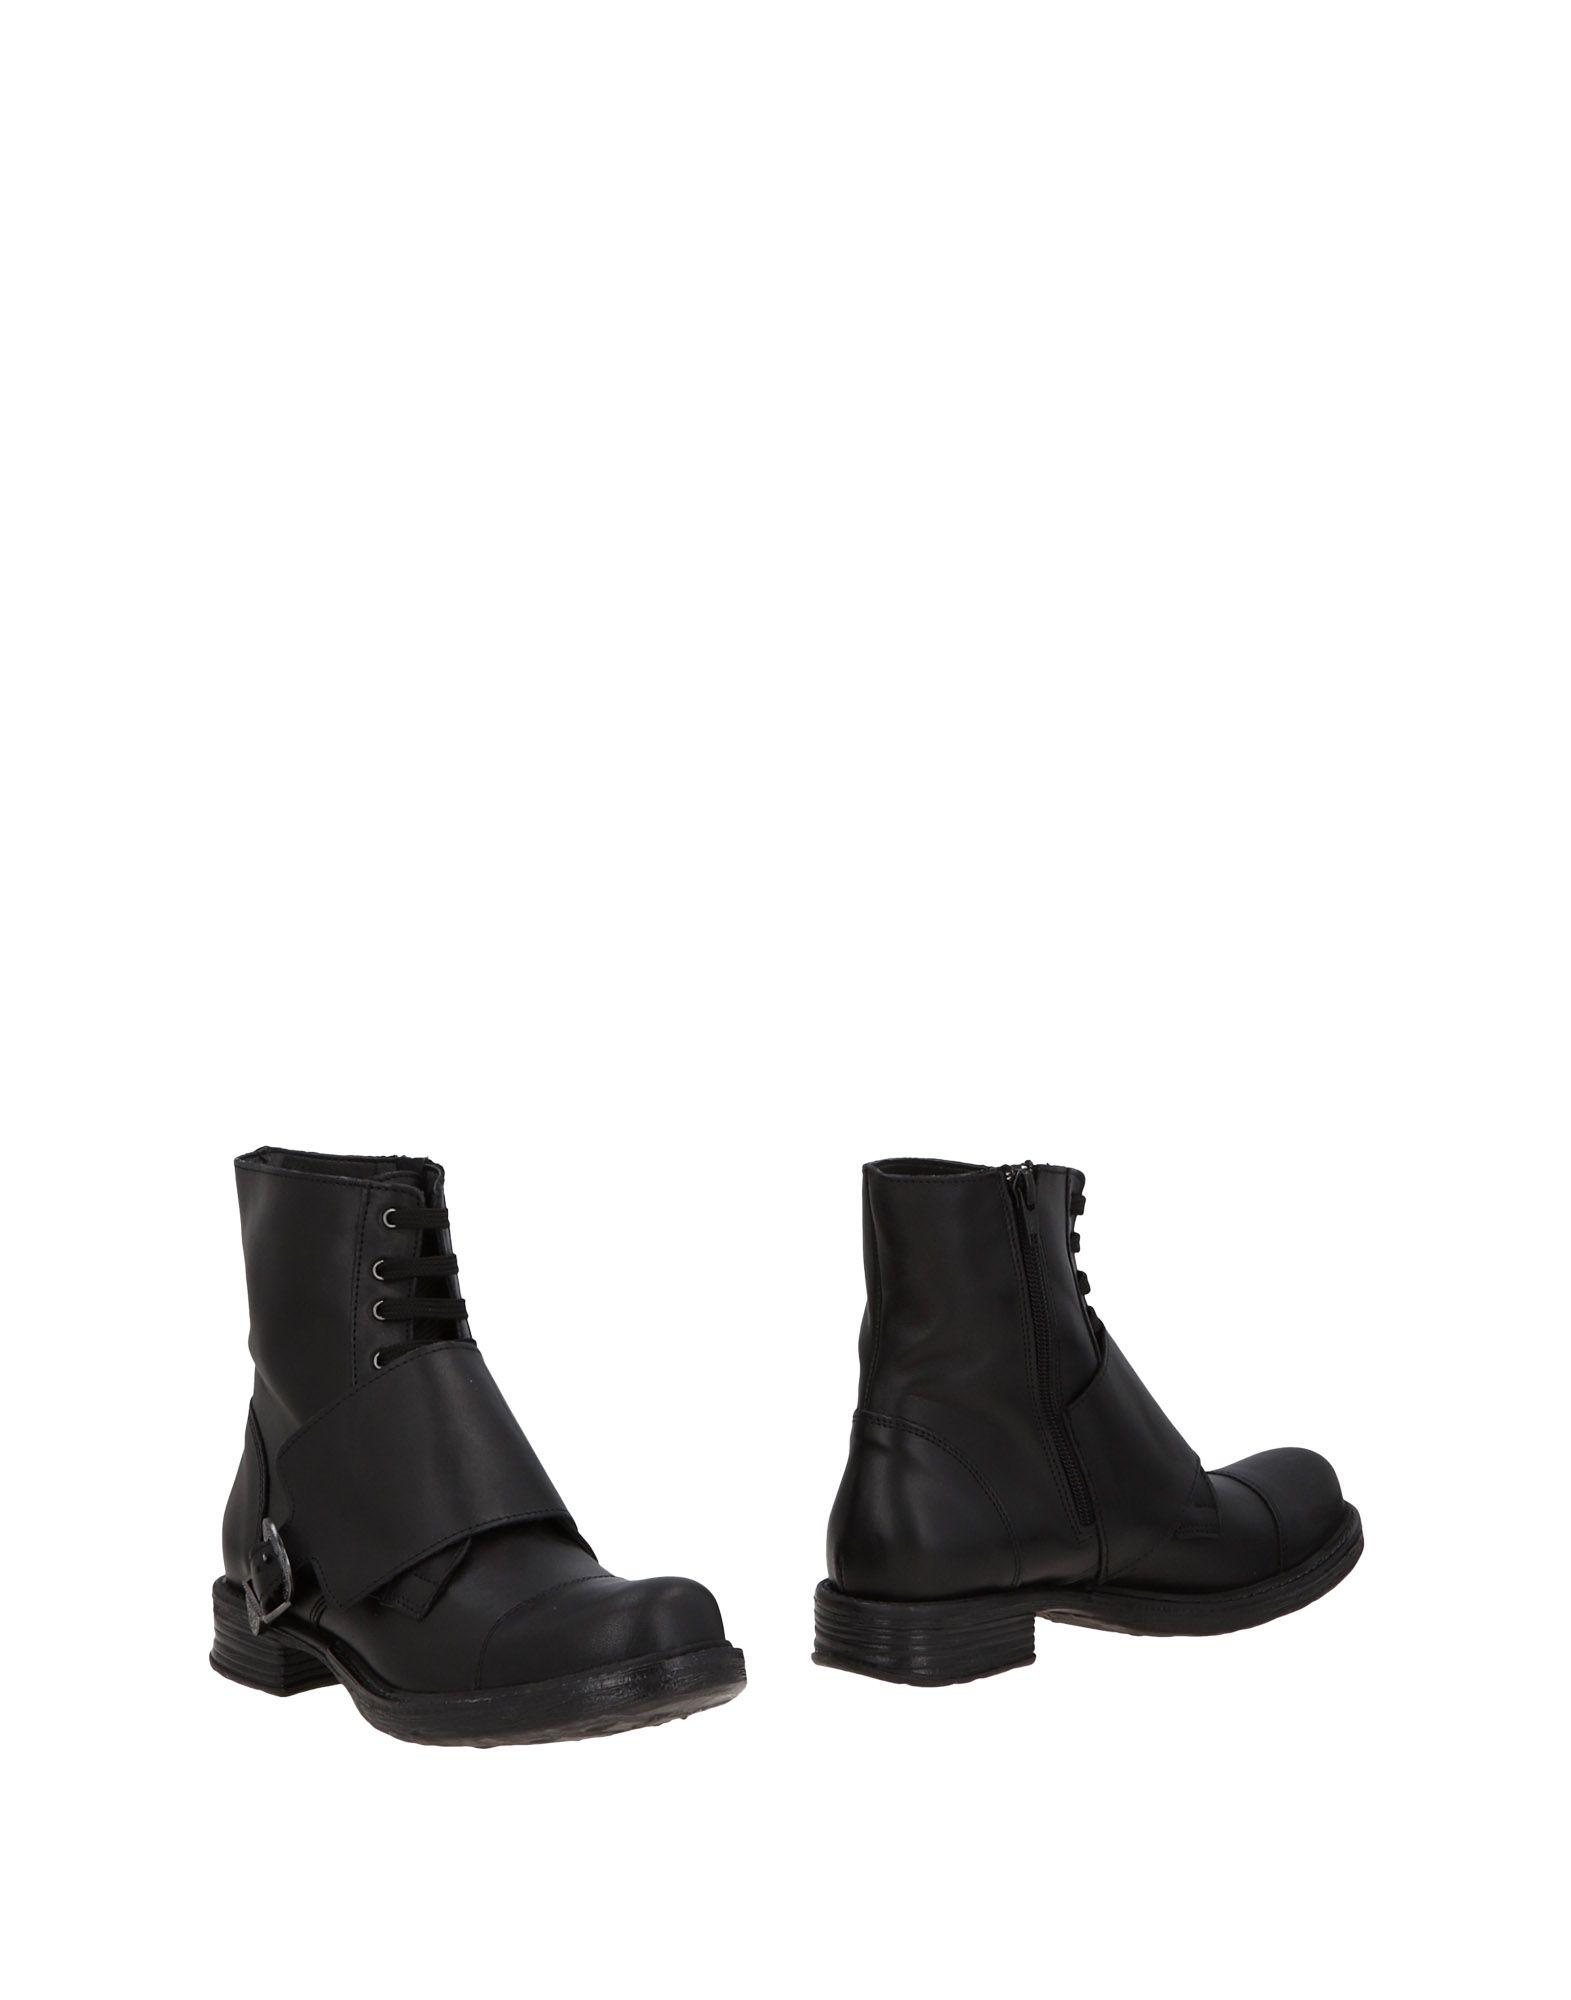 Nila & Nila Stiefelette Damen  11476810KI Gute Qualität beliebte Schuhe